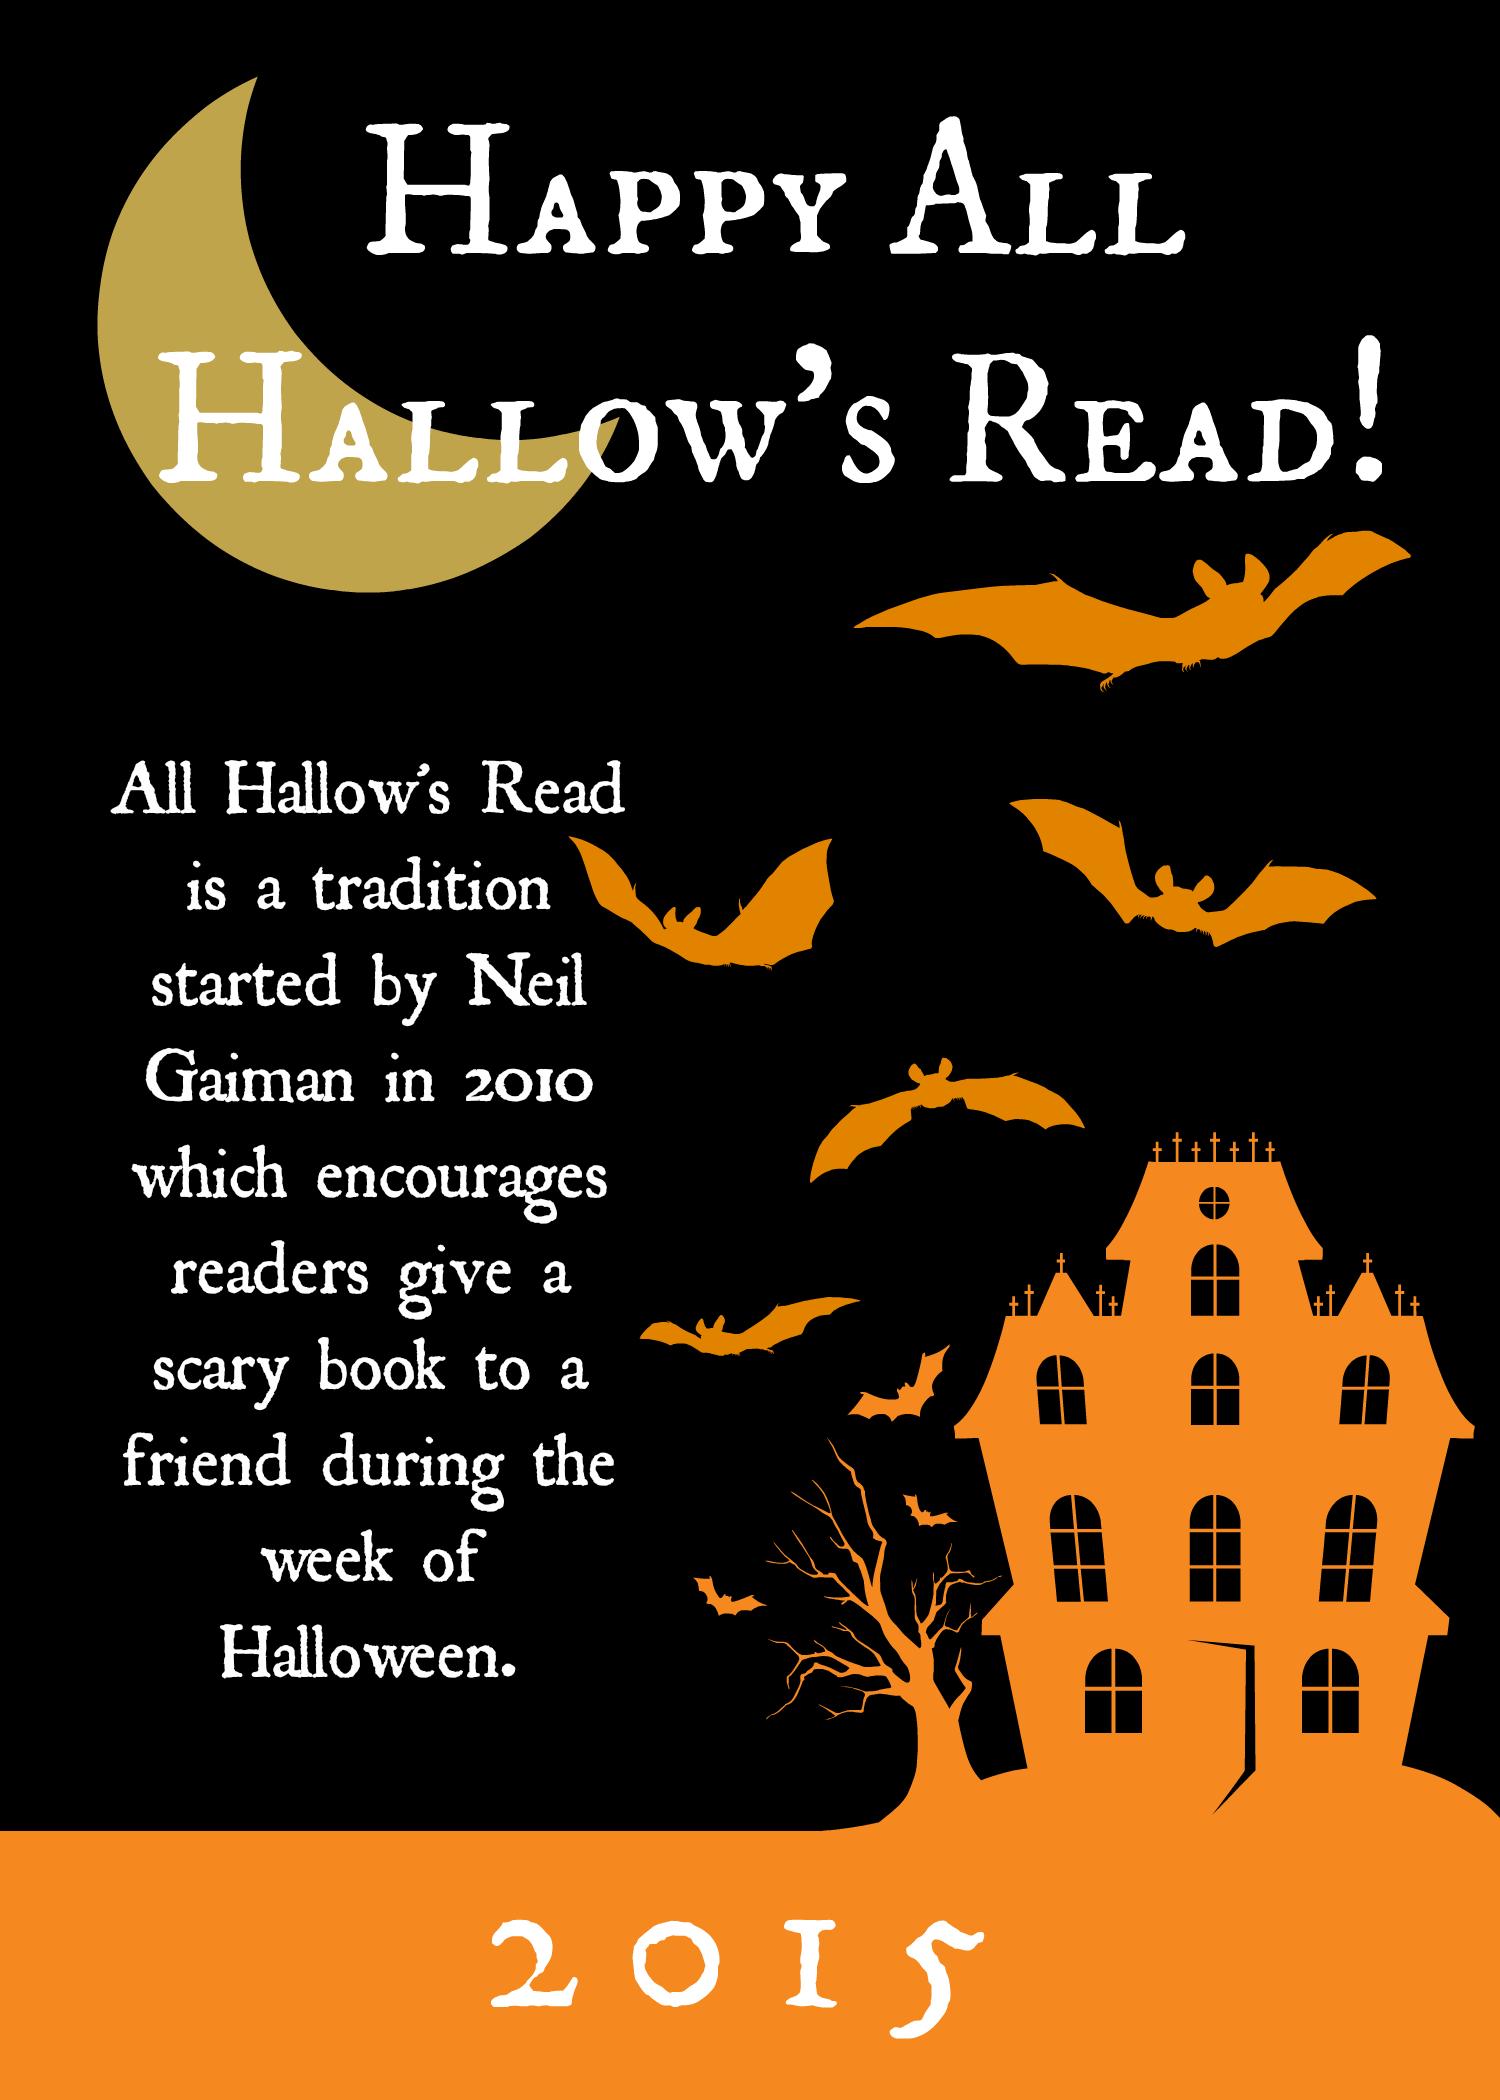 Alll-Hallows-Read-Bats